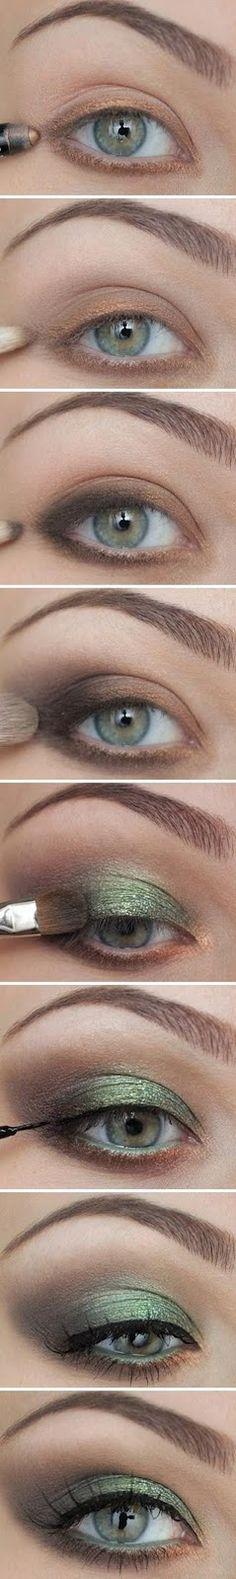 Beautiful emerald green eye make up